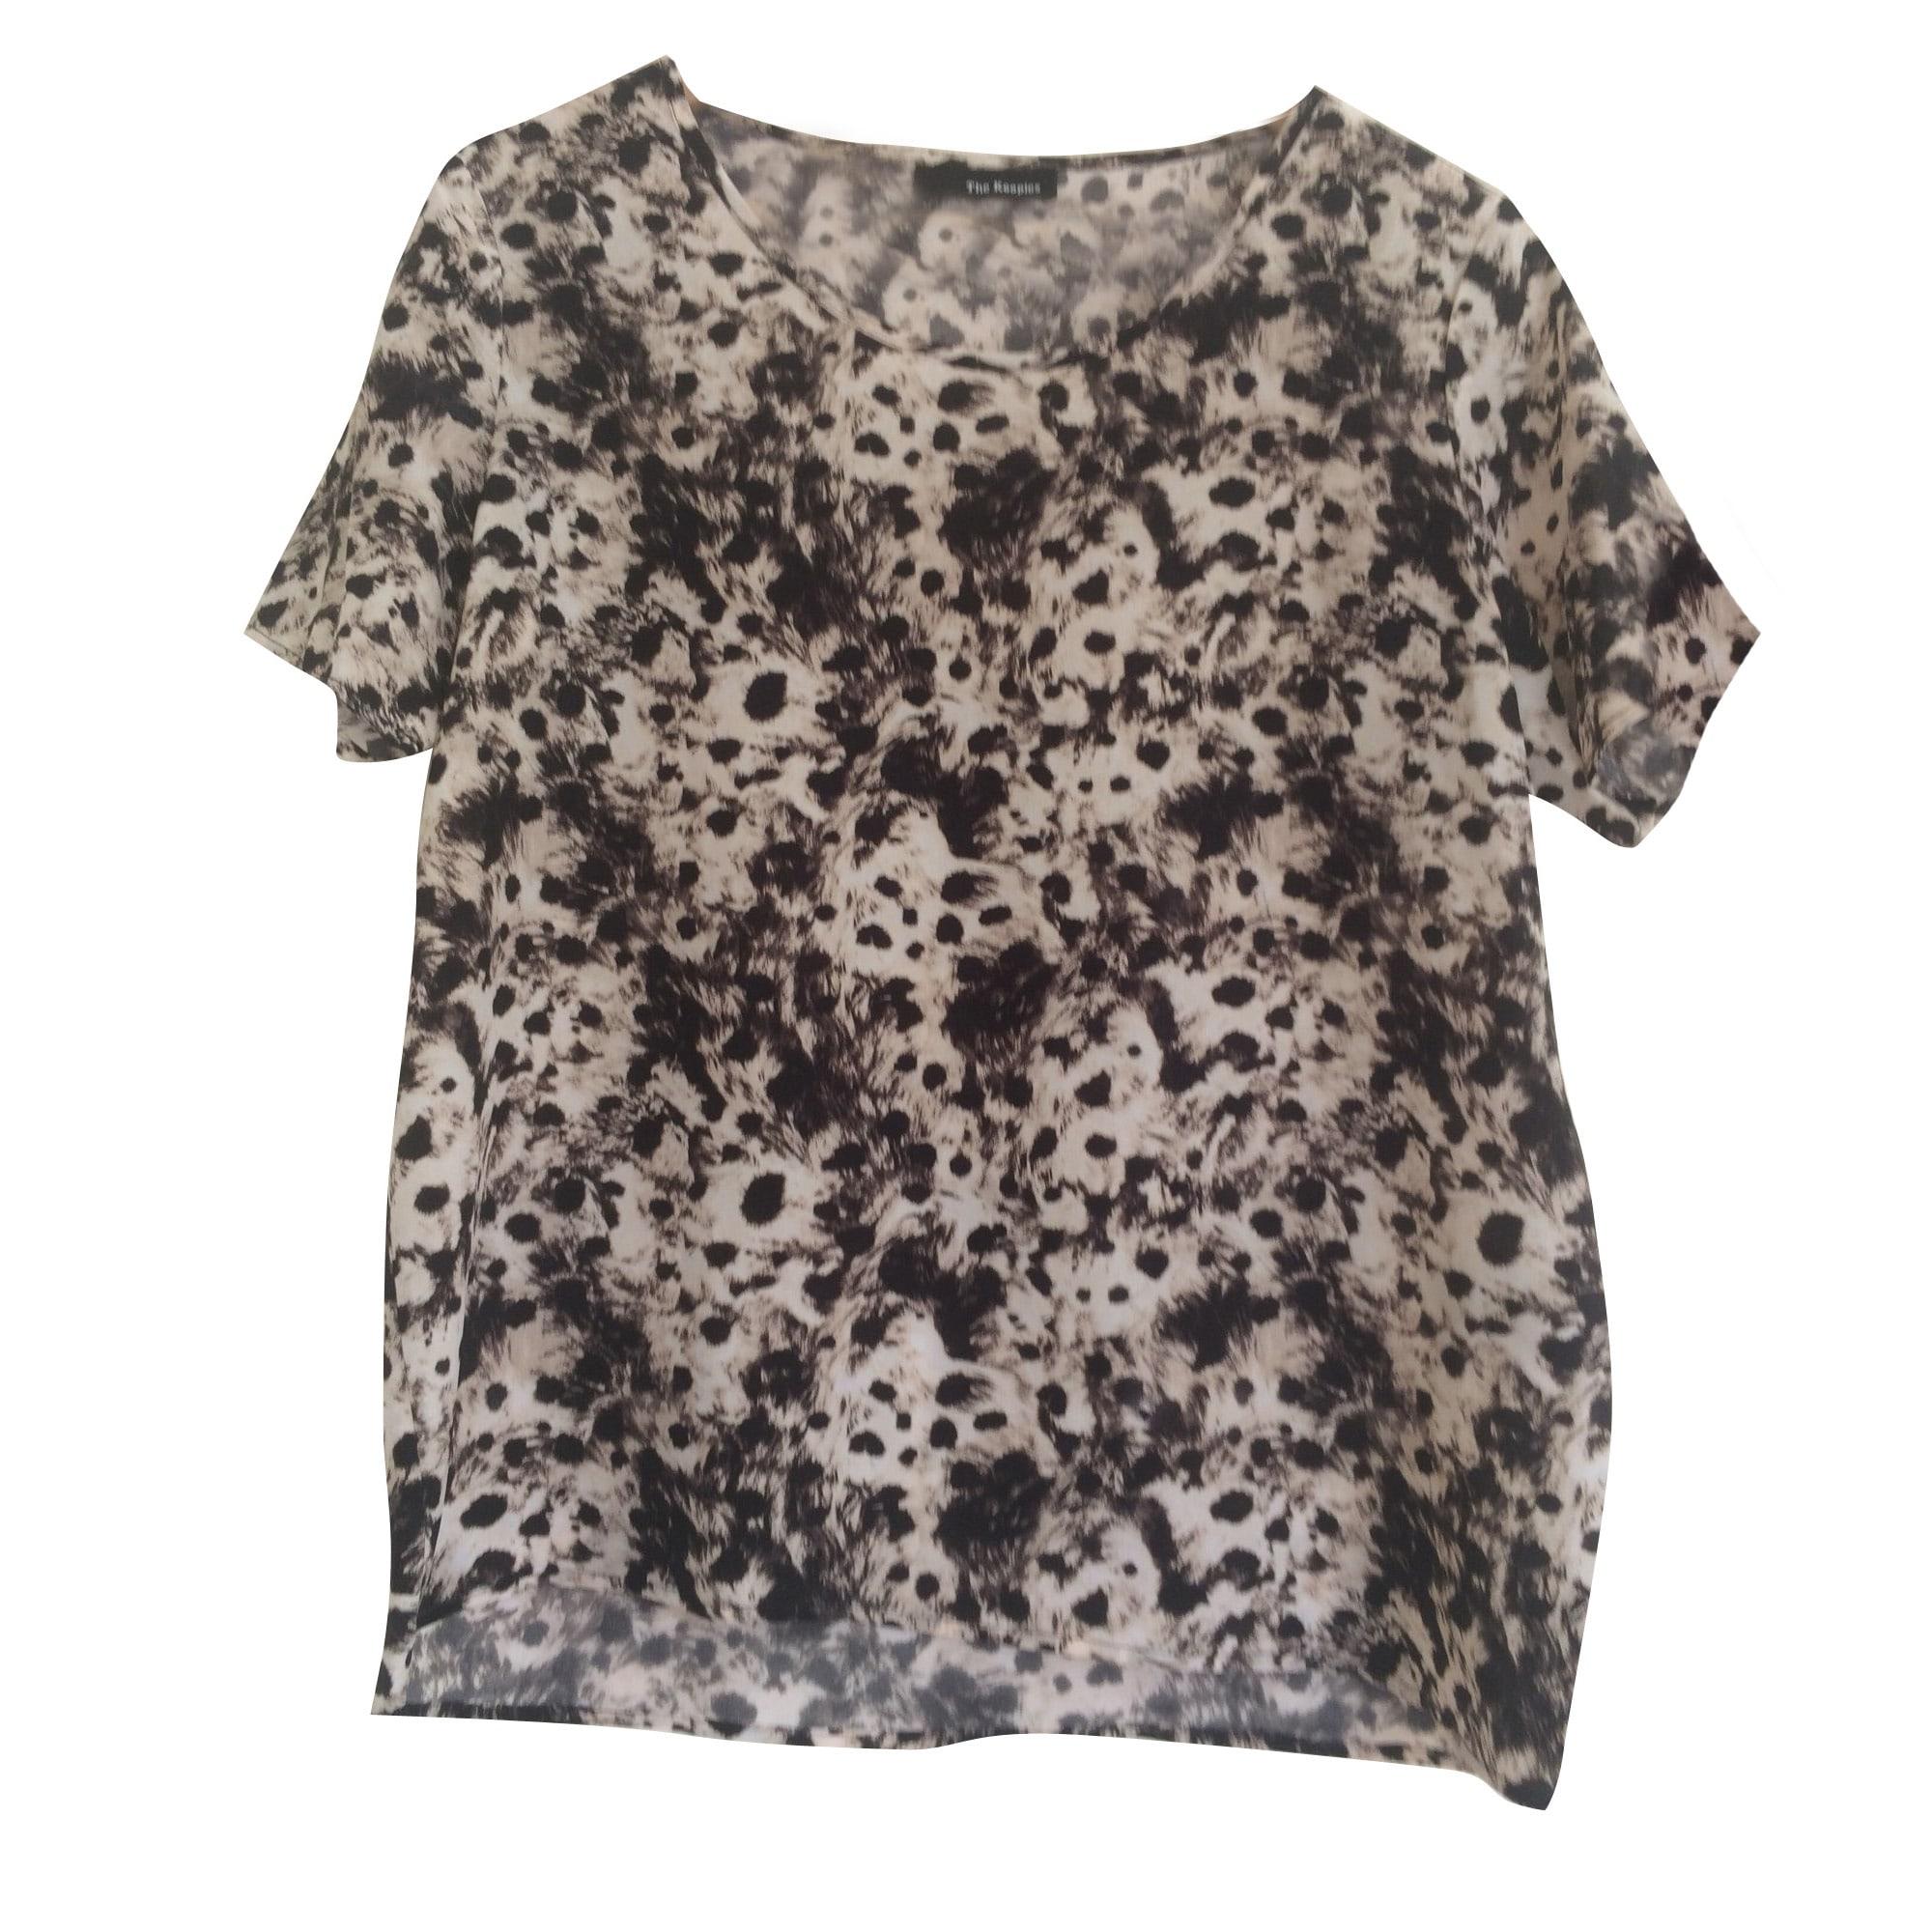 Top, tee-shirt THE KOOPLES Imprimés animaliers